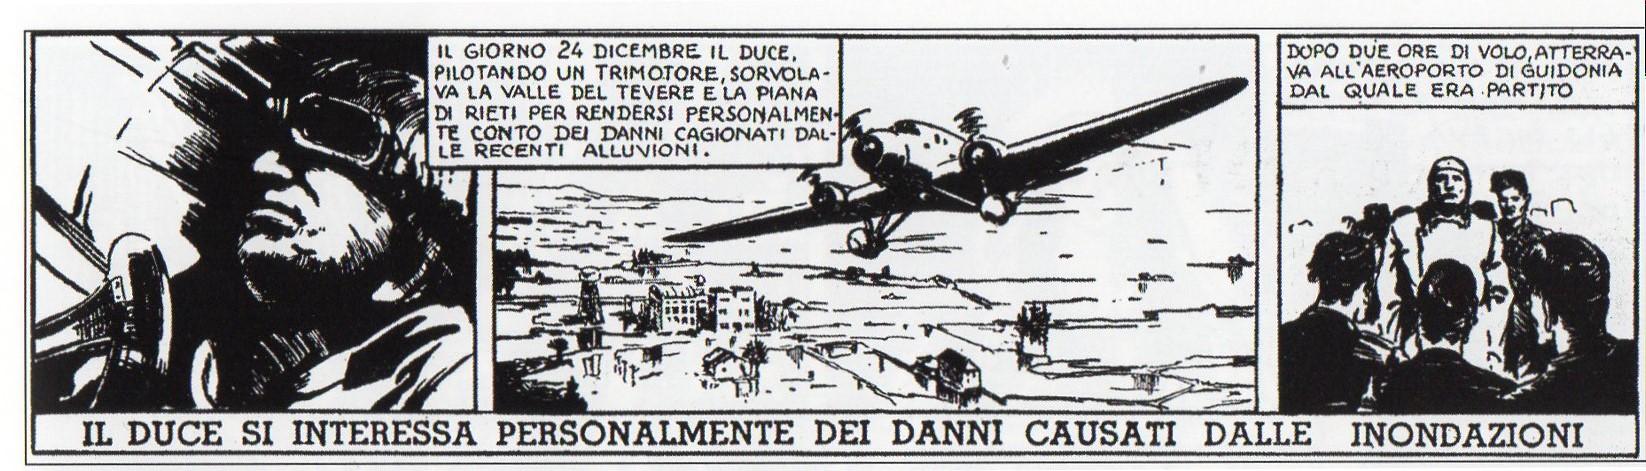 "Fascismo & Fumetto: il ""paradosso"" avventuroso"